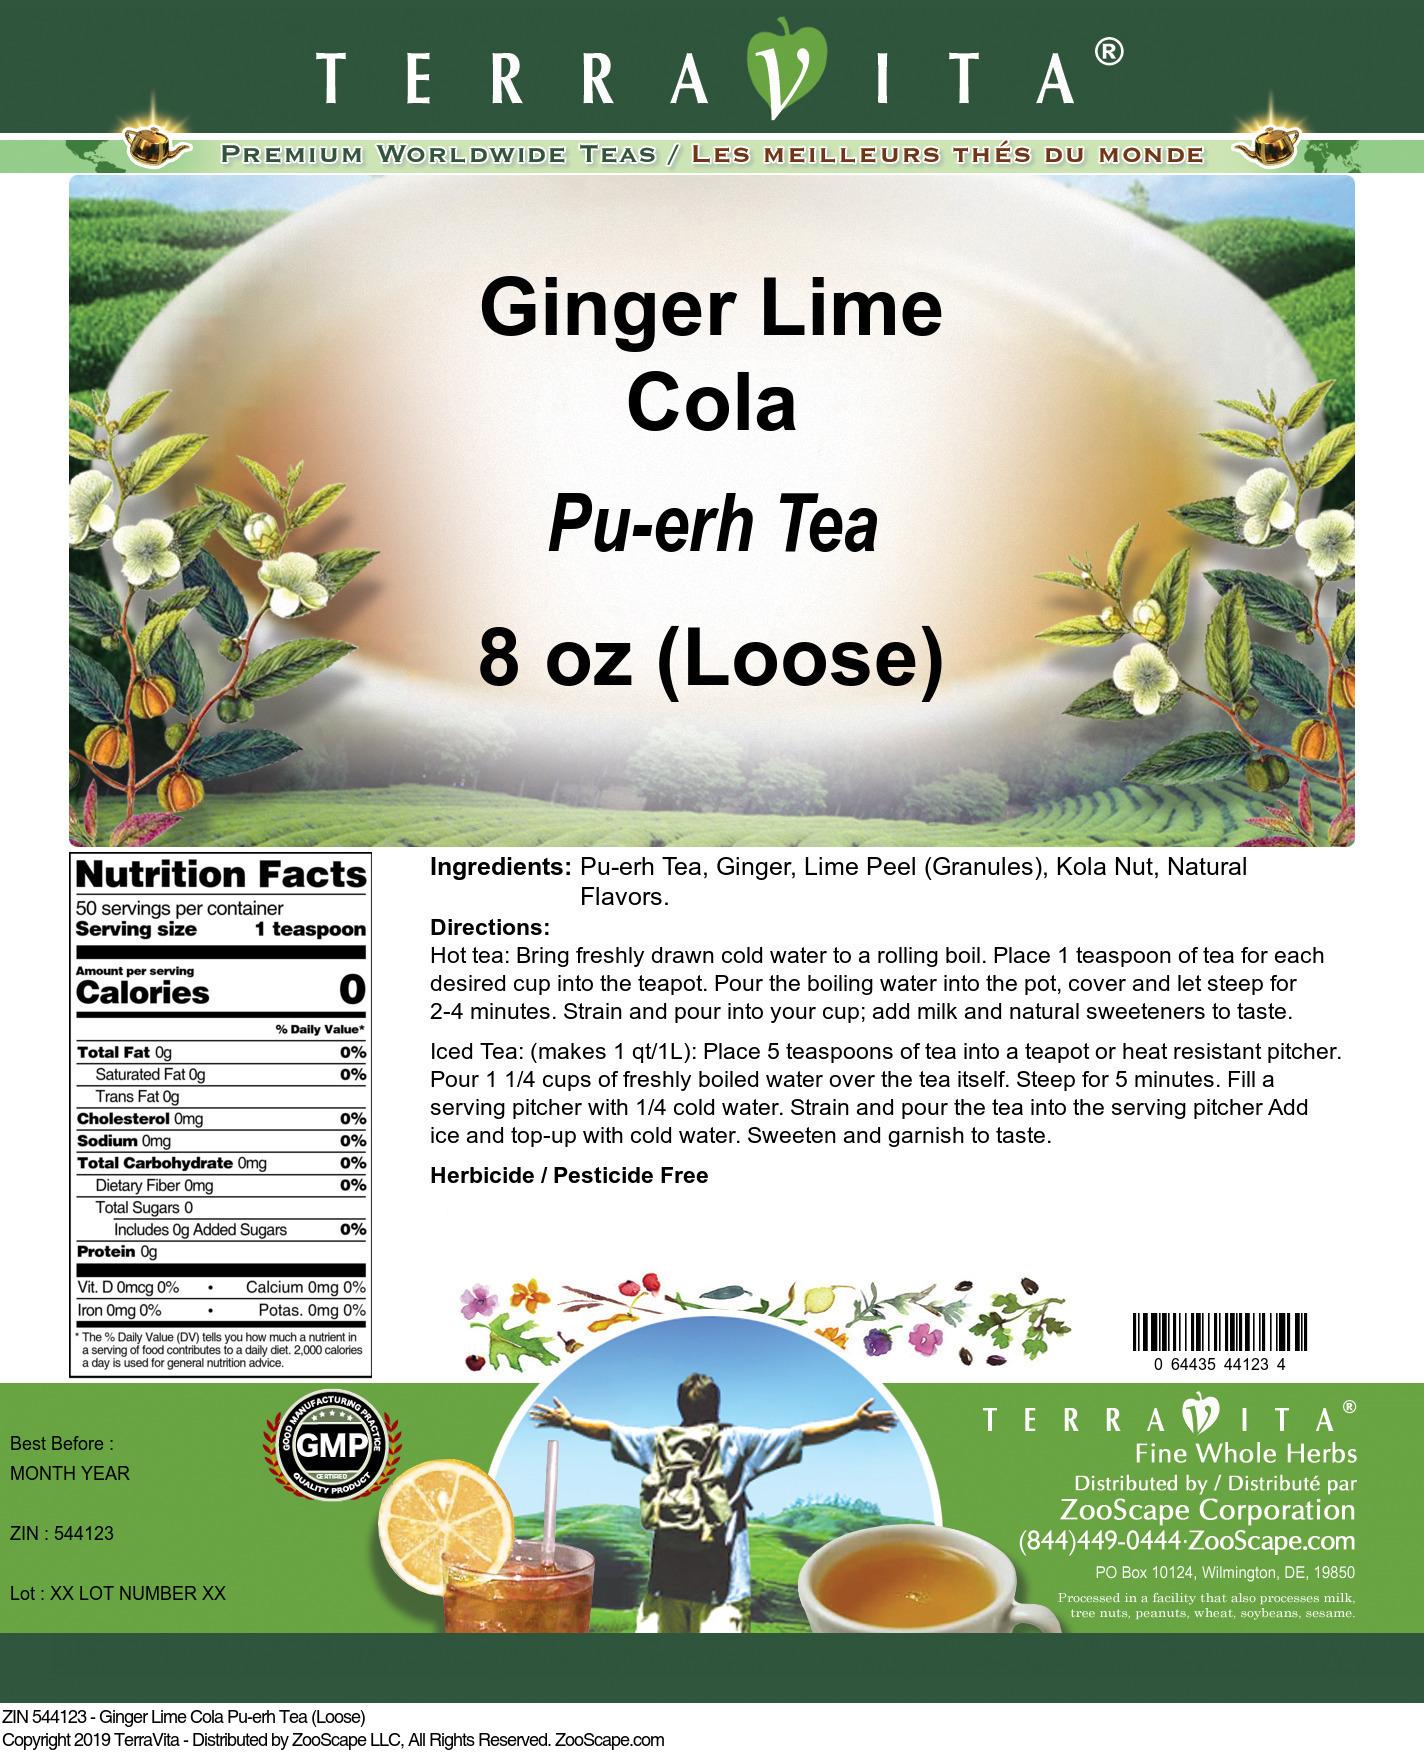 Ginger Lime Cola Pu-erh Tea (Loose)